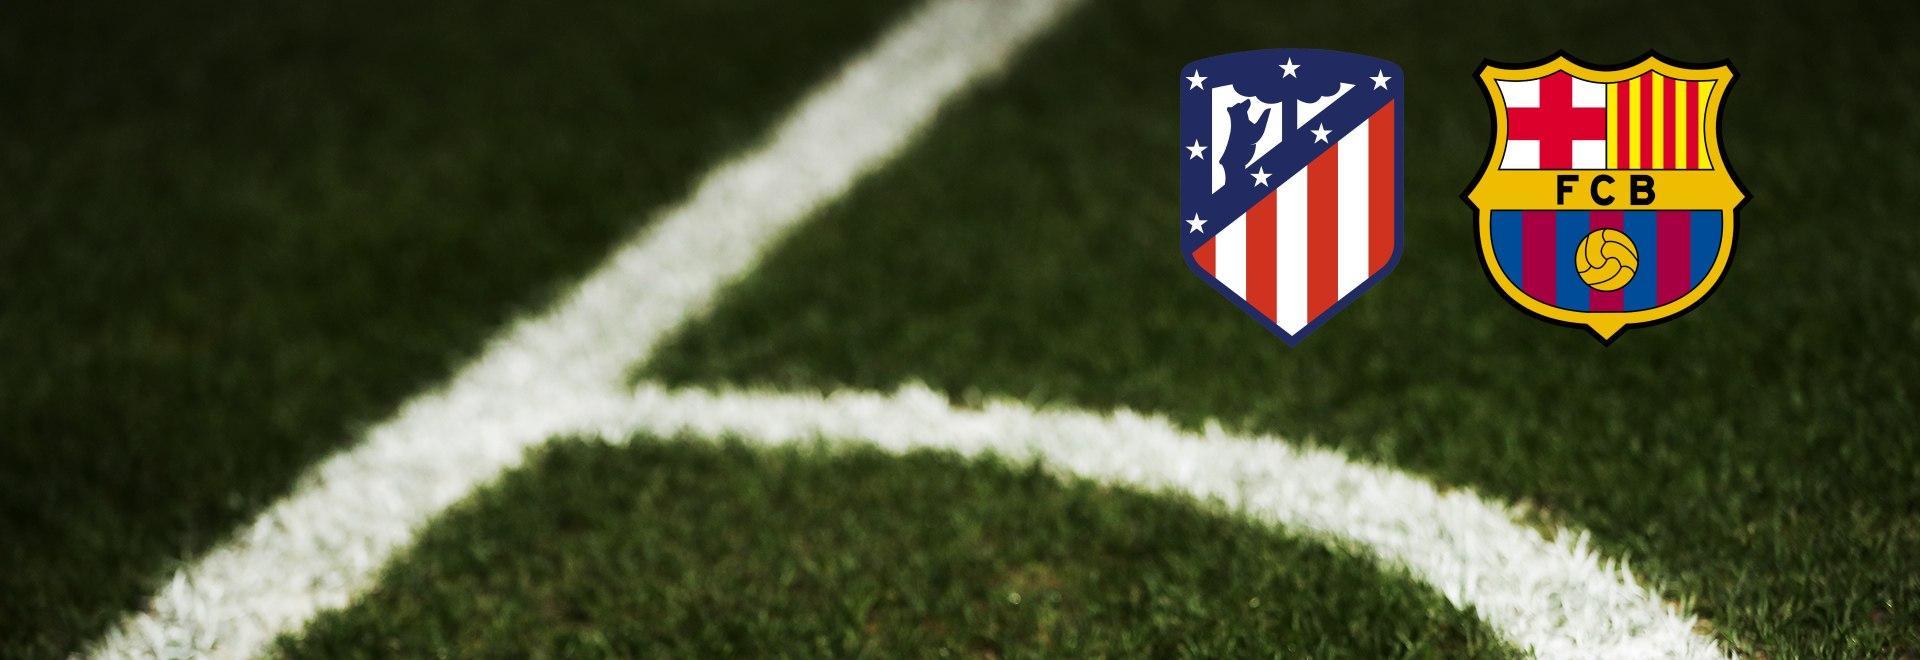 Atletico Madrid - Barcellona. 10a g.